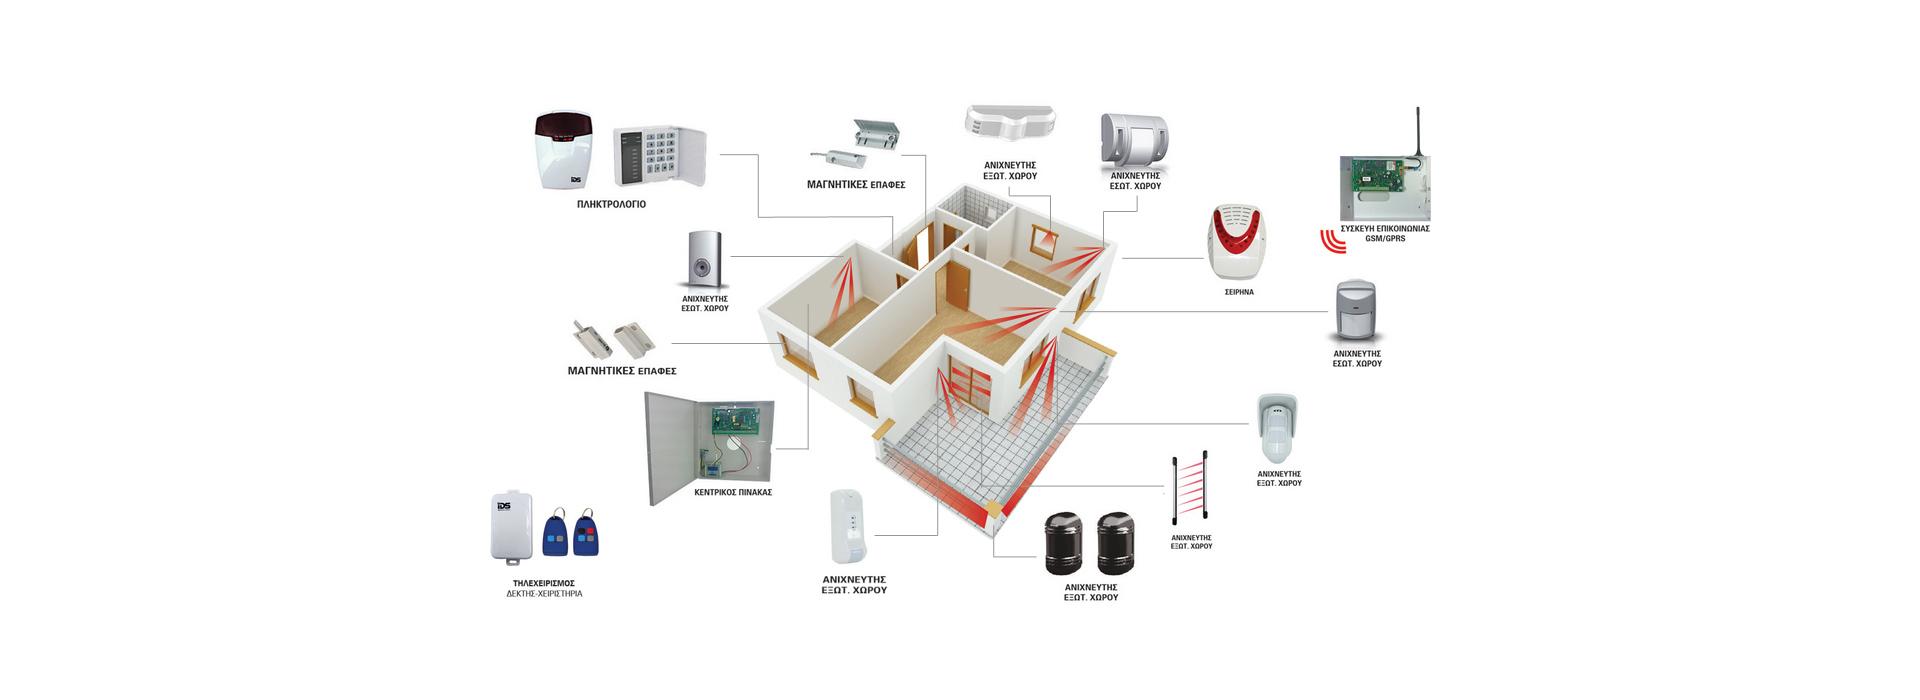 Captal Security - Προϊόντα & Υπηρεσίες Φύλαξης - Ασφαλείας